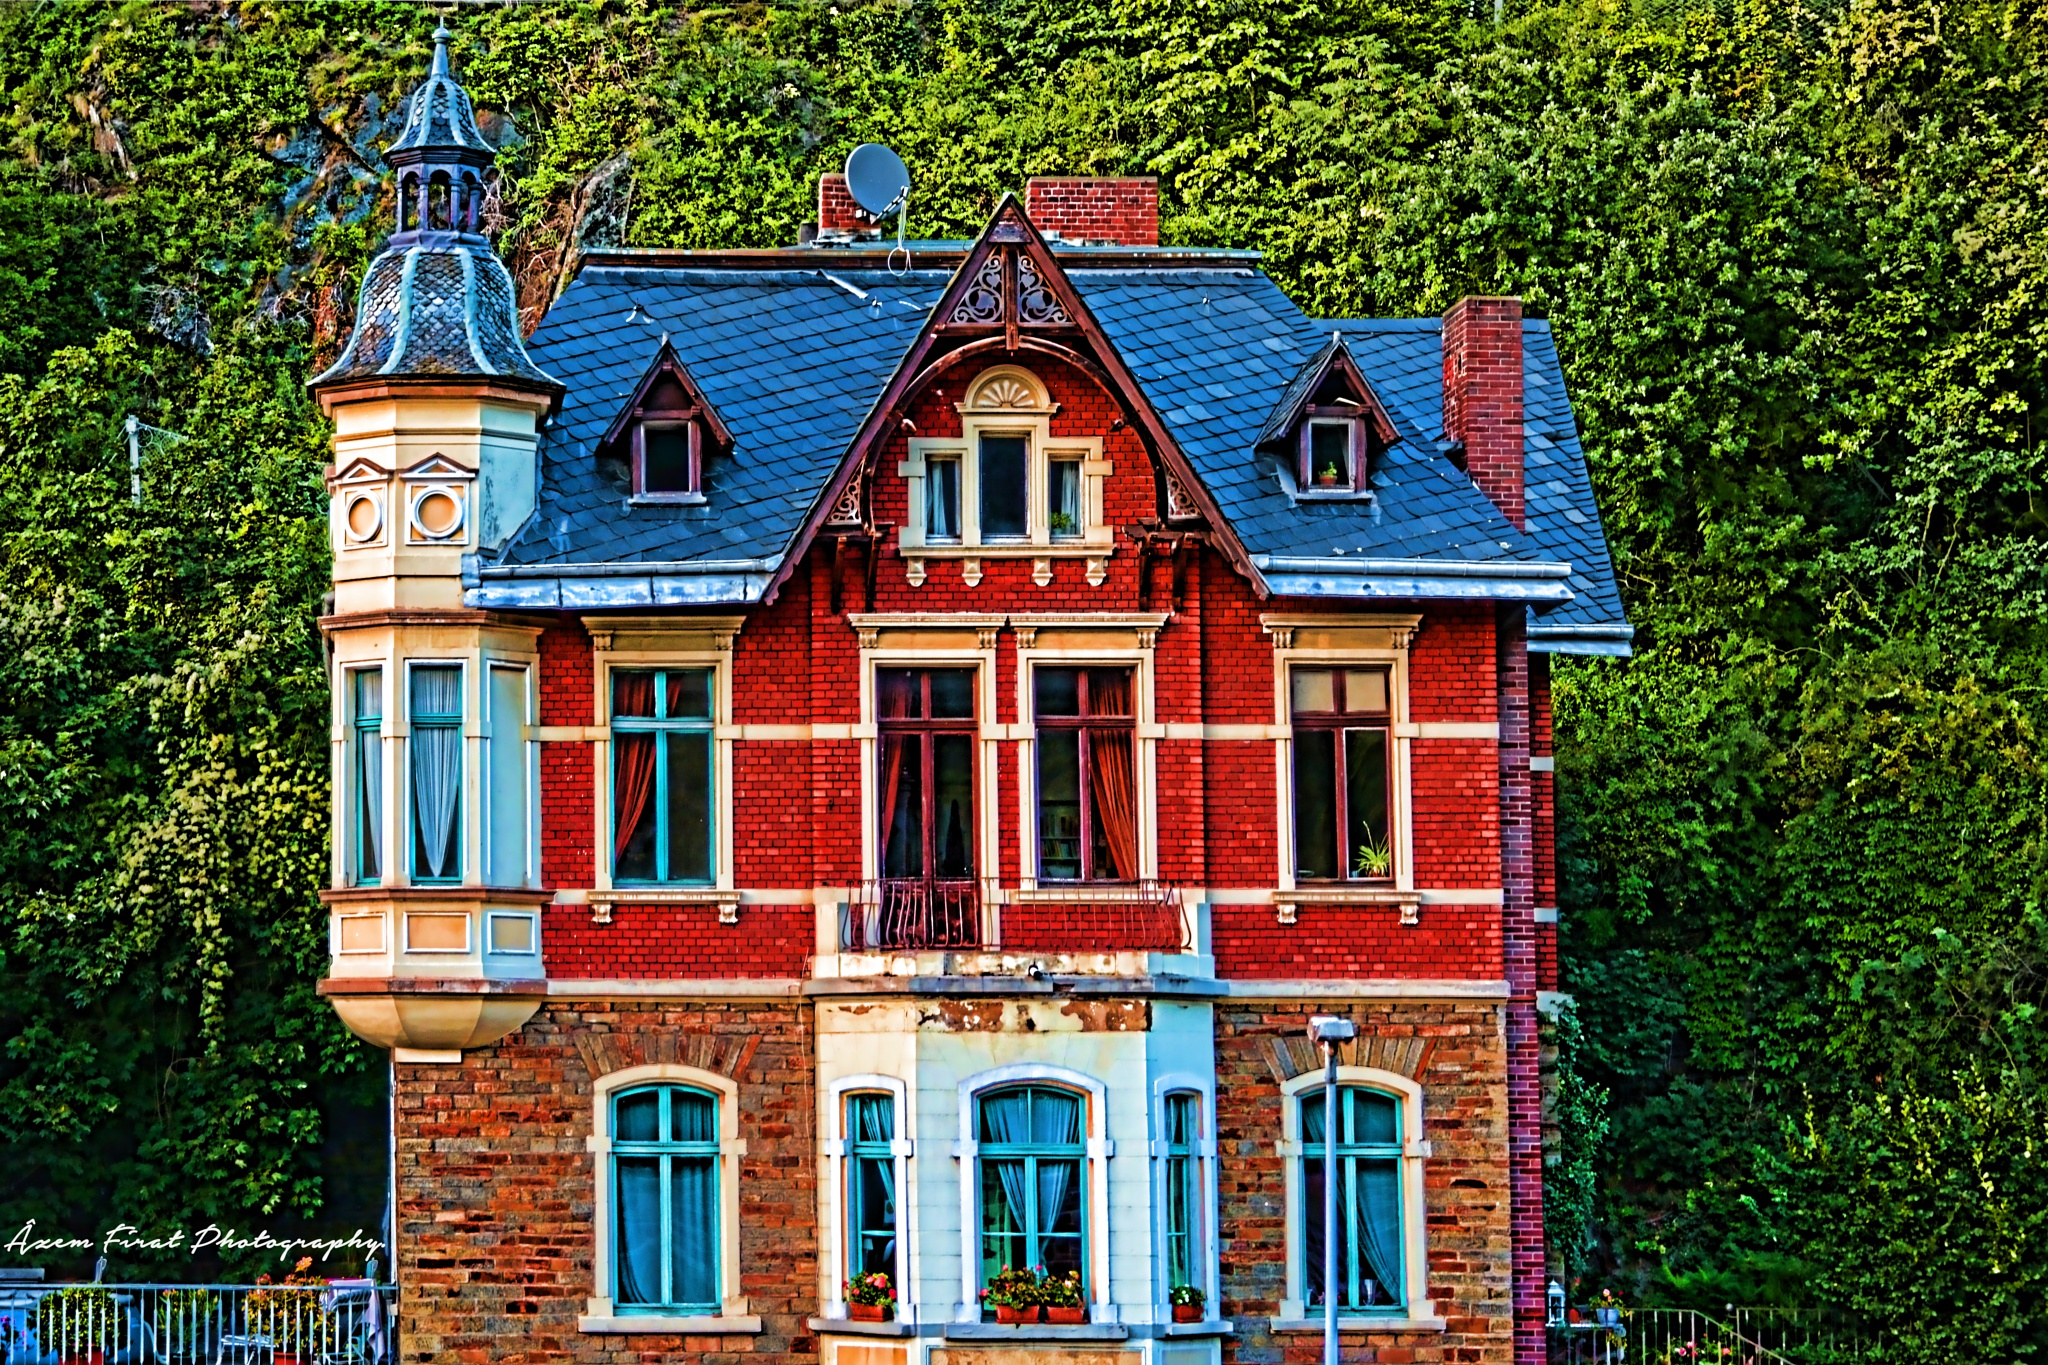 An alone house in Rheinland-Pfalz. by azem.firat